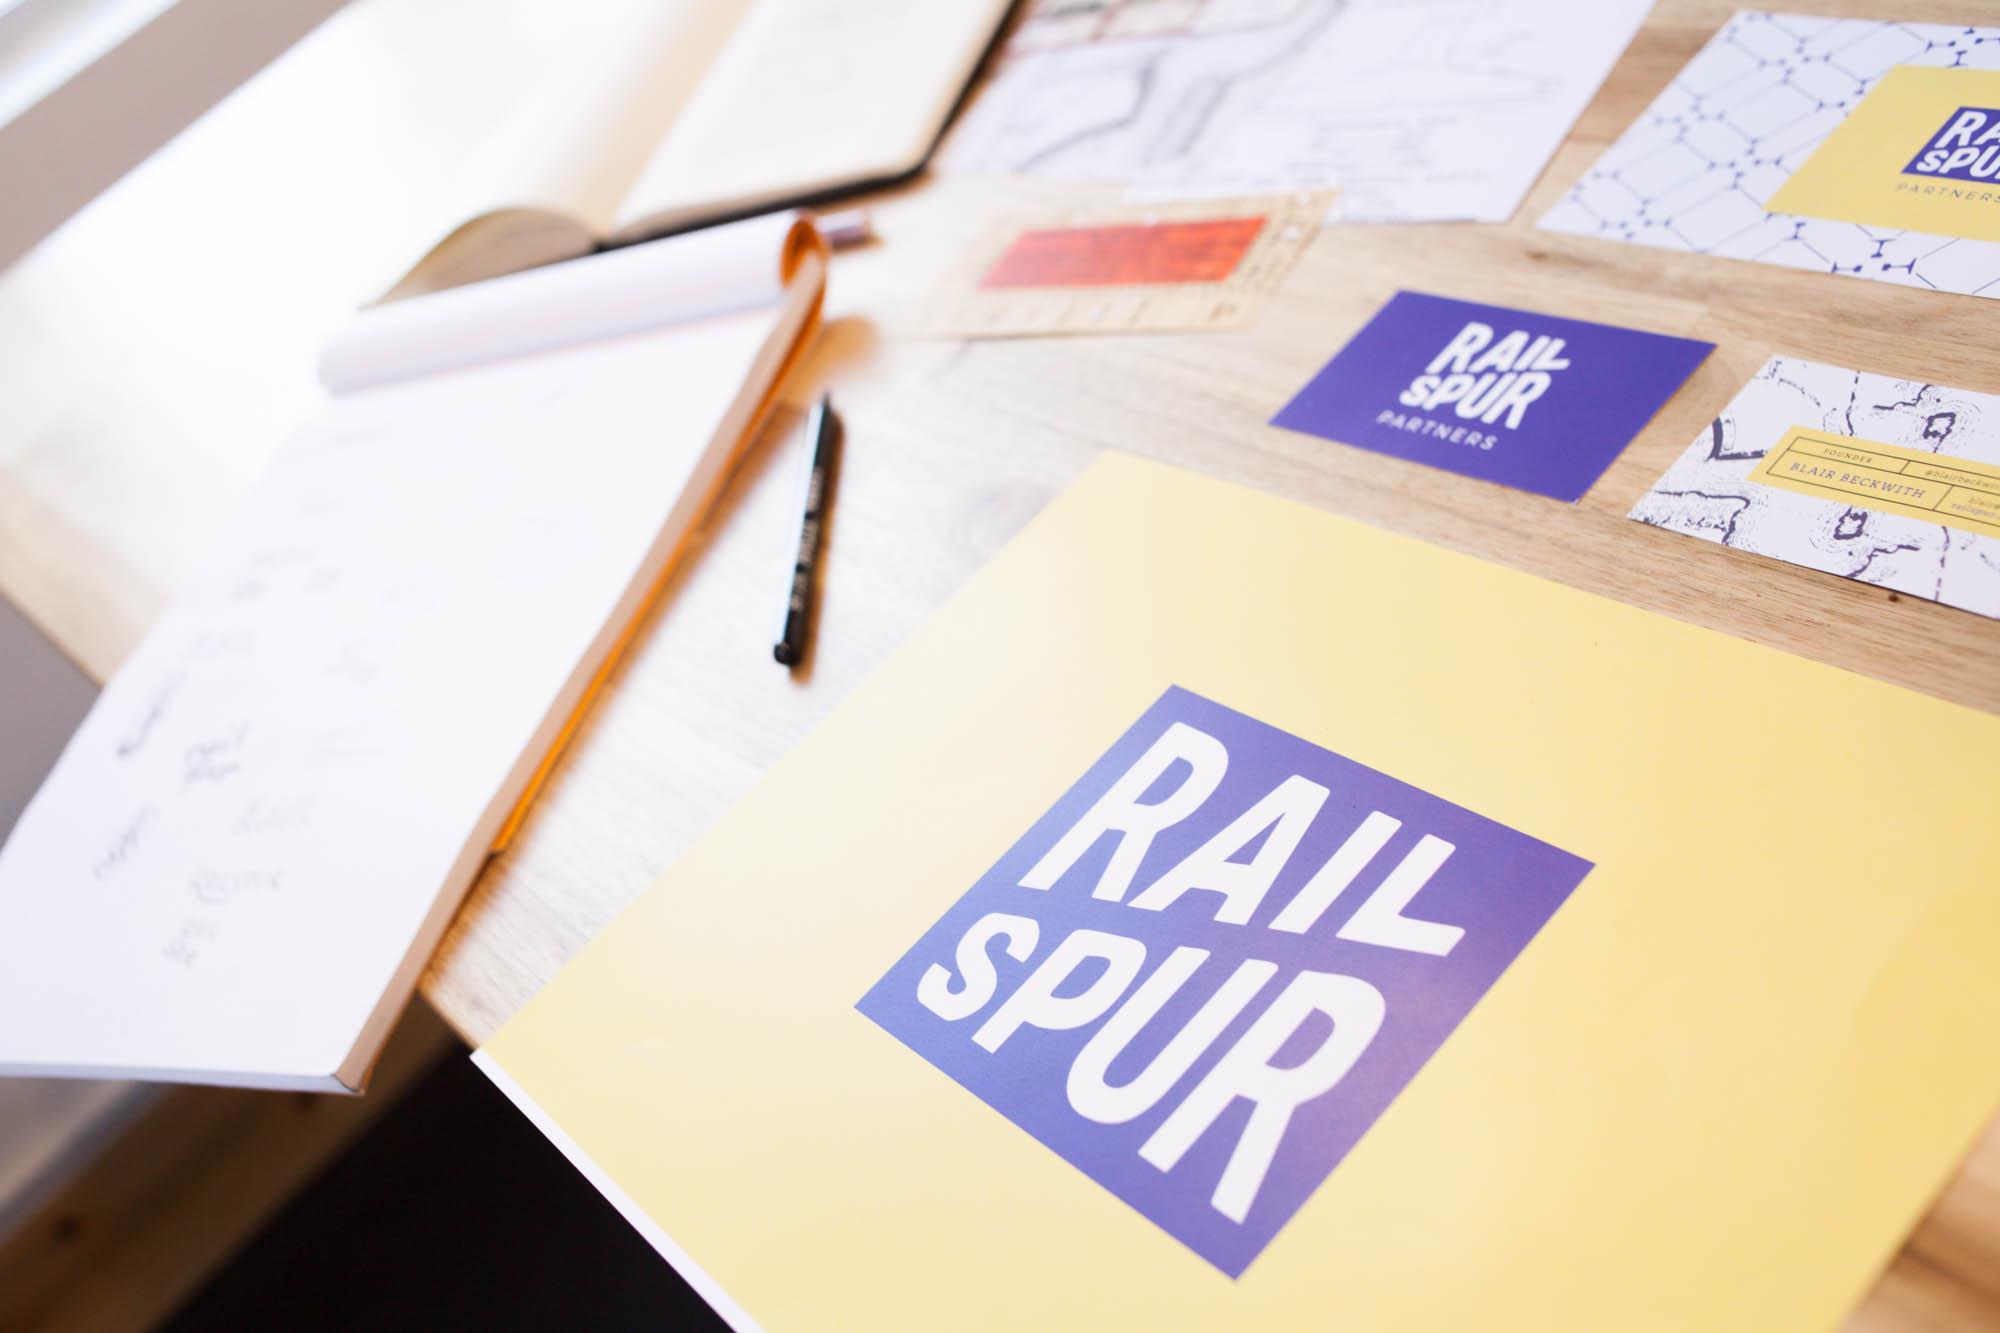 Railspur-28